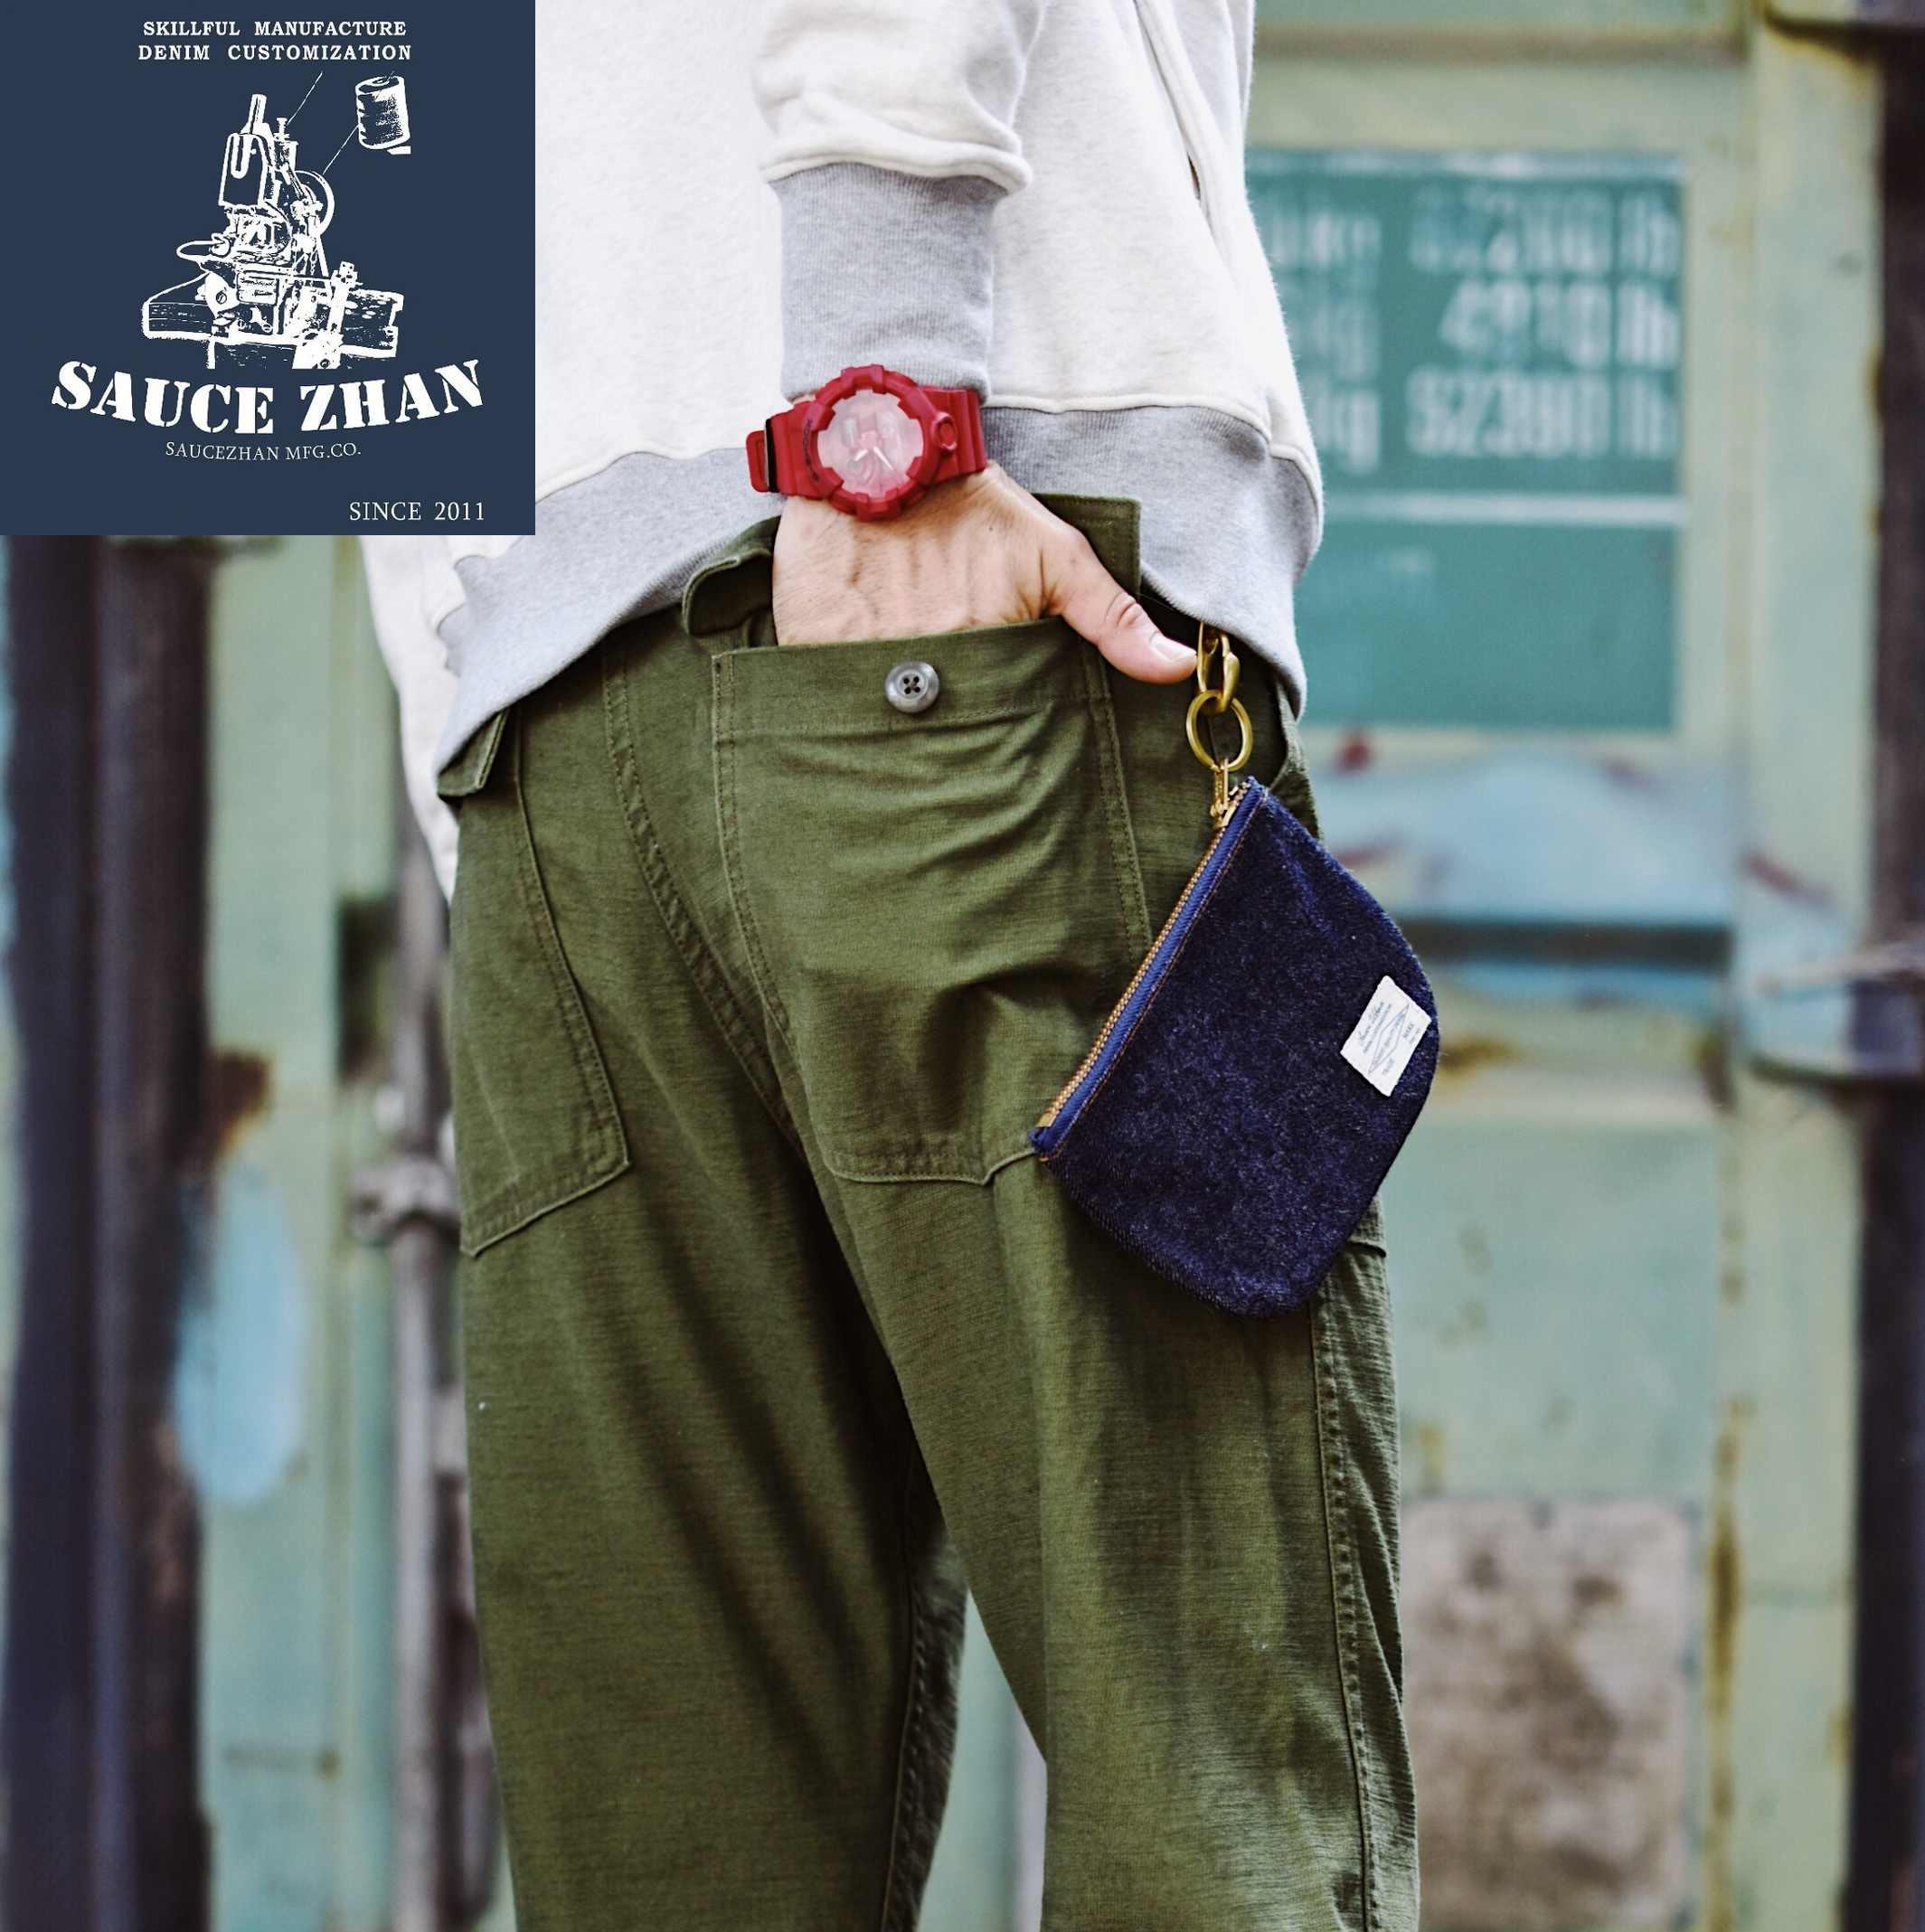 SauceZhan OG-107 ความเมื่อยล้า Utility กางเกงทหารกางเกง Casual Retro VINTAGE CLASSIC Mens กางเกง Baker กางเกงกางเกงผู้ชาย